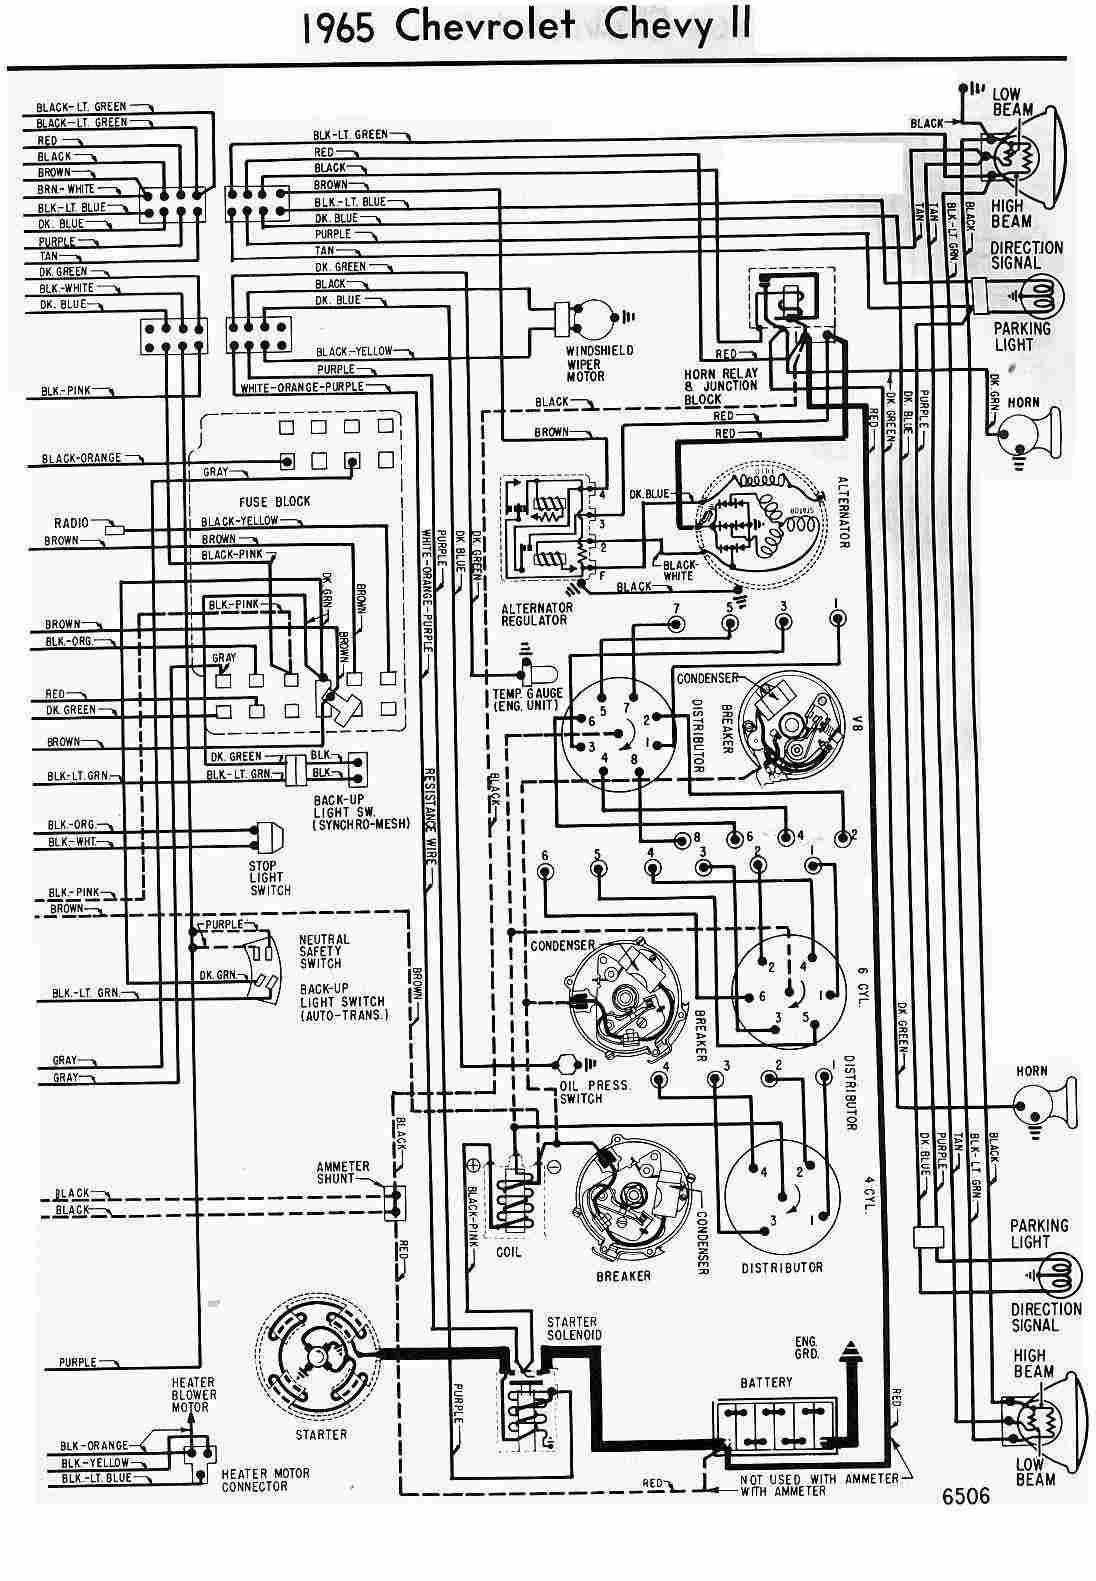 1971 Chevelle Wiring Diagram Tempwrature